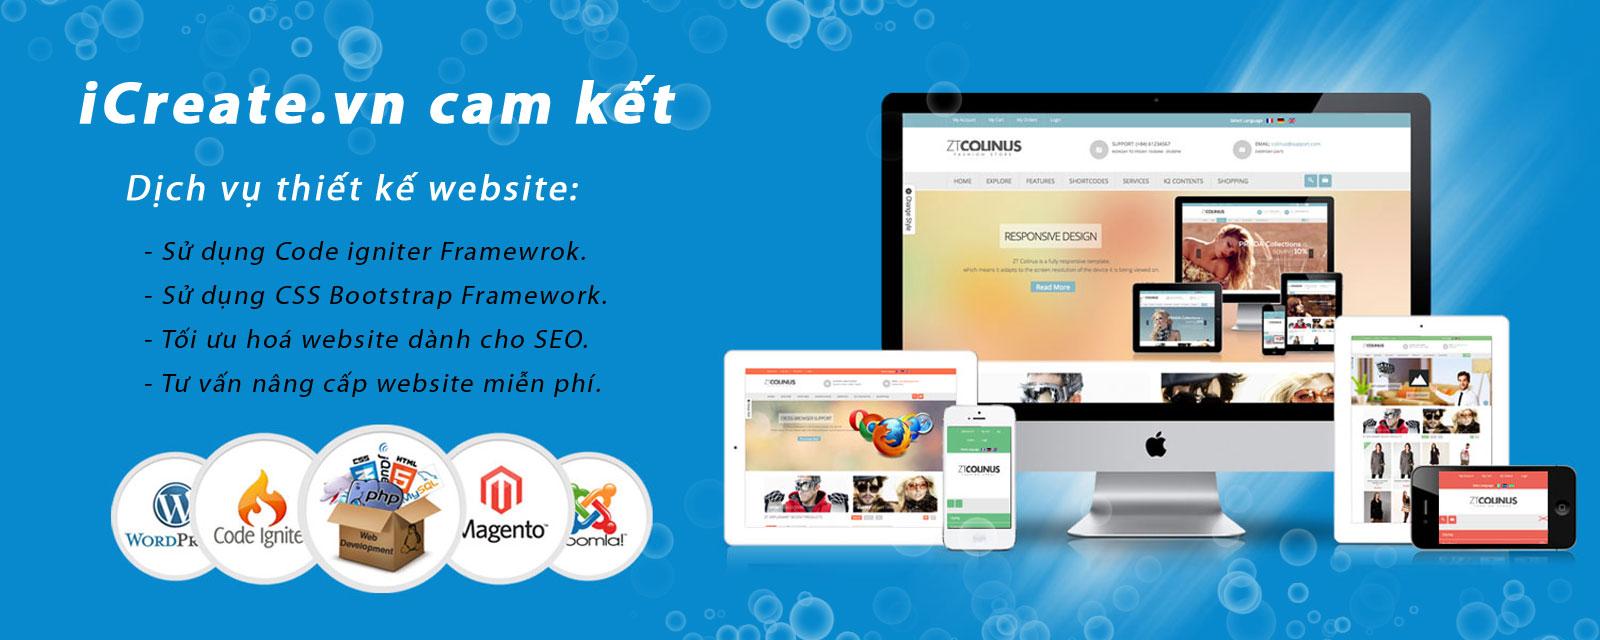 Ưu thế khi thiết kế website tại iCreate.vn